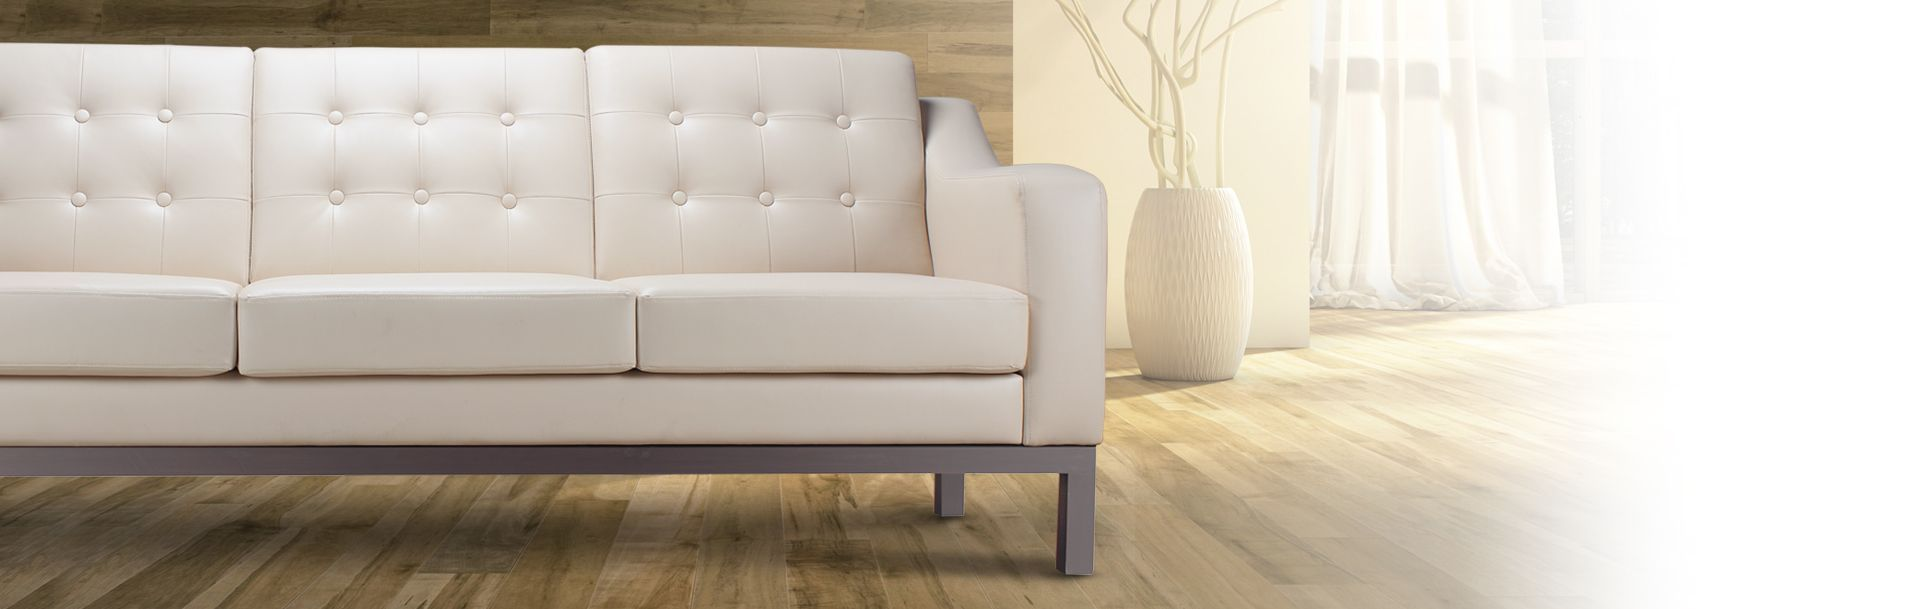 buycouchandsofasonline in india on truecouch  buy couch